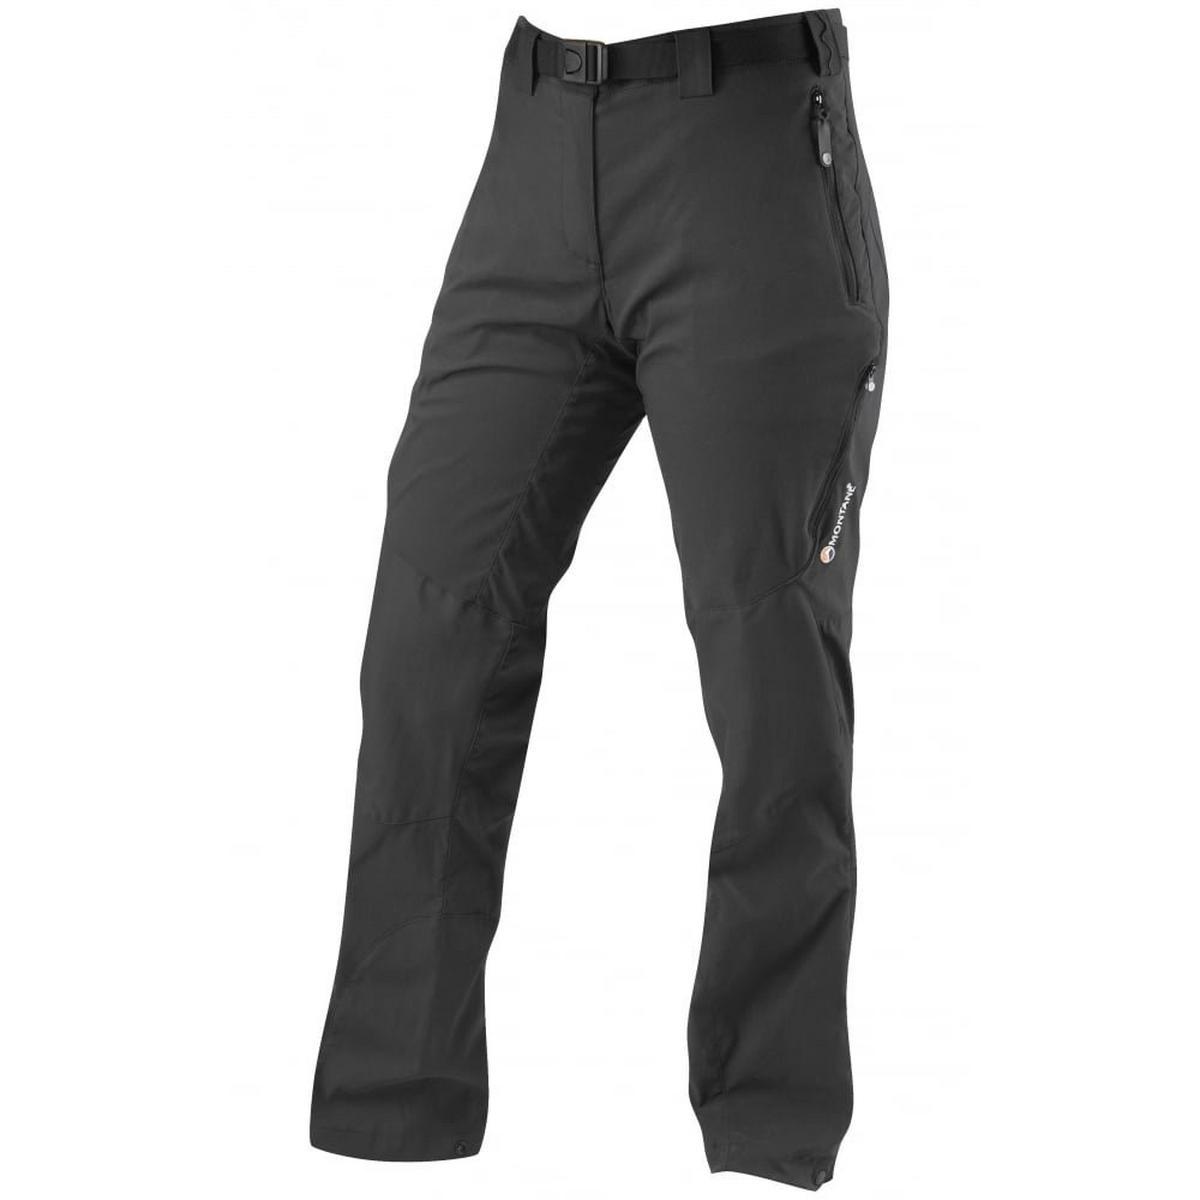 Montane Pants Women's Terra Ridge SHORT Leg Trousers Black